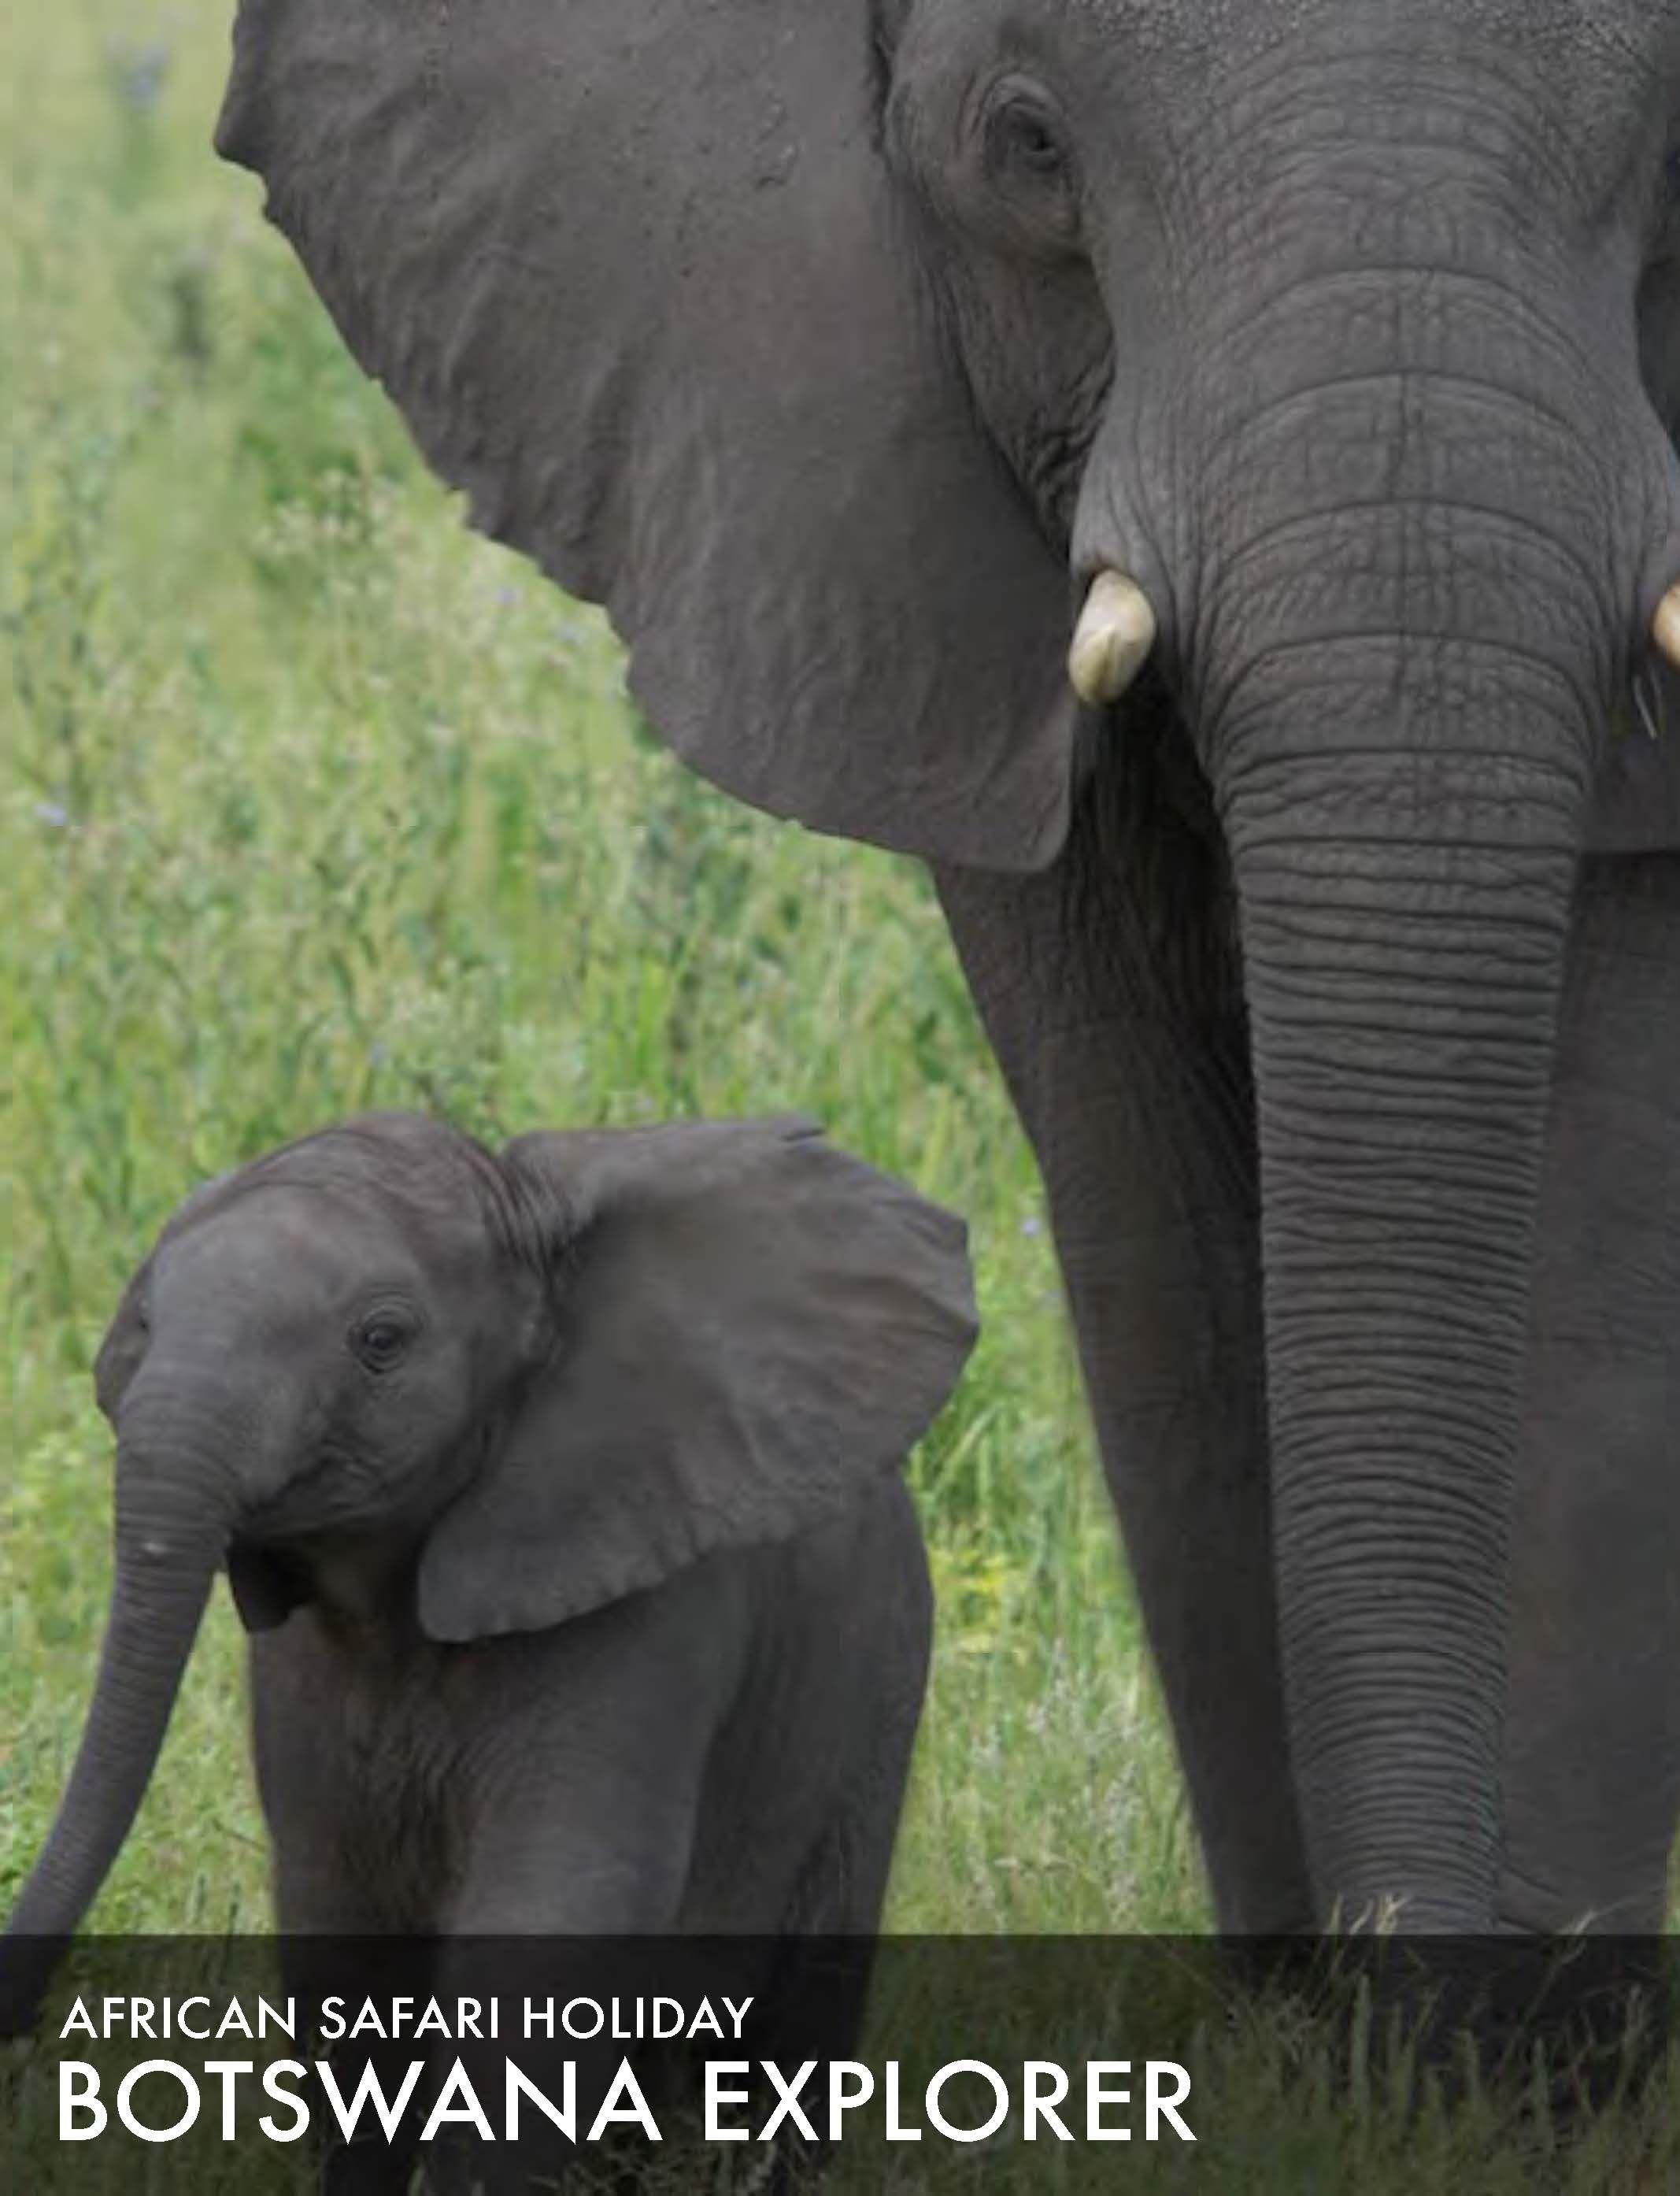 African safari tour 2015: Botswana Explorer